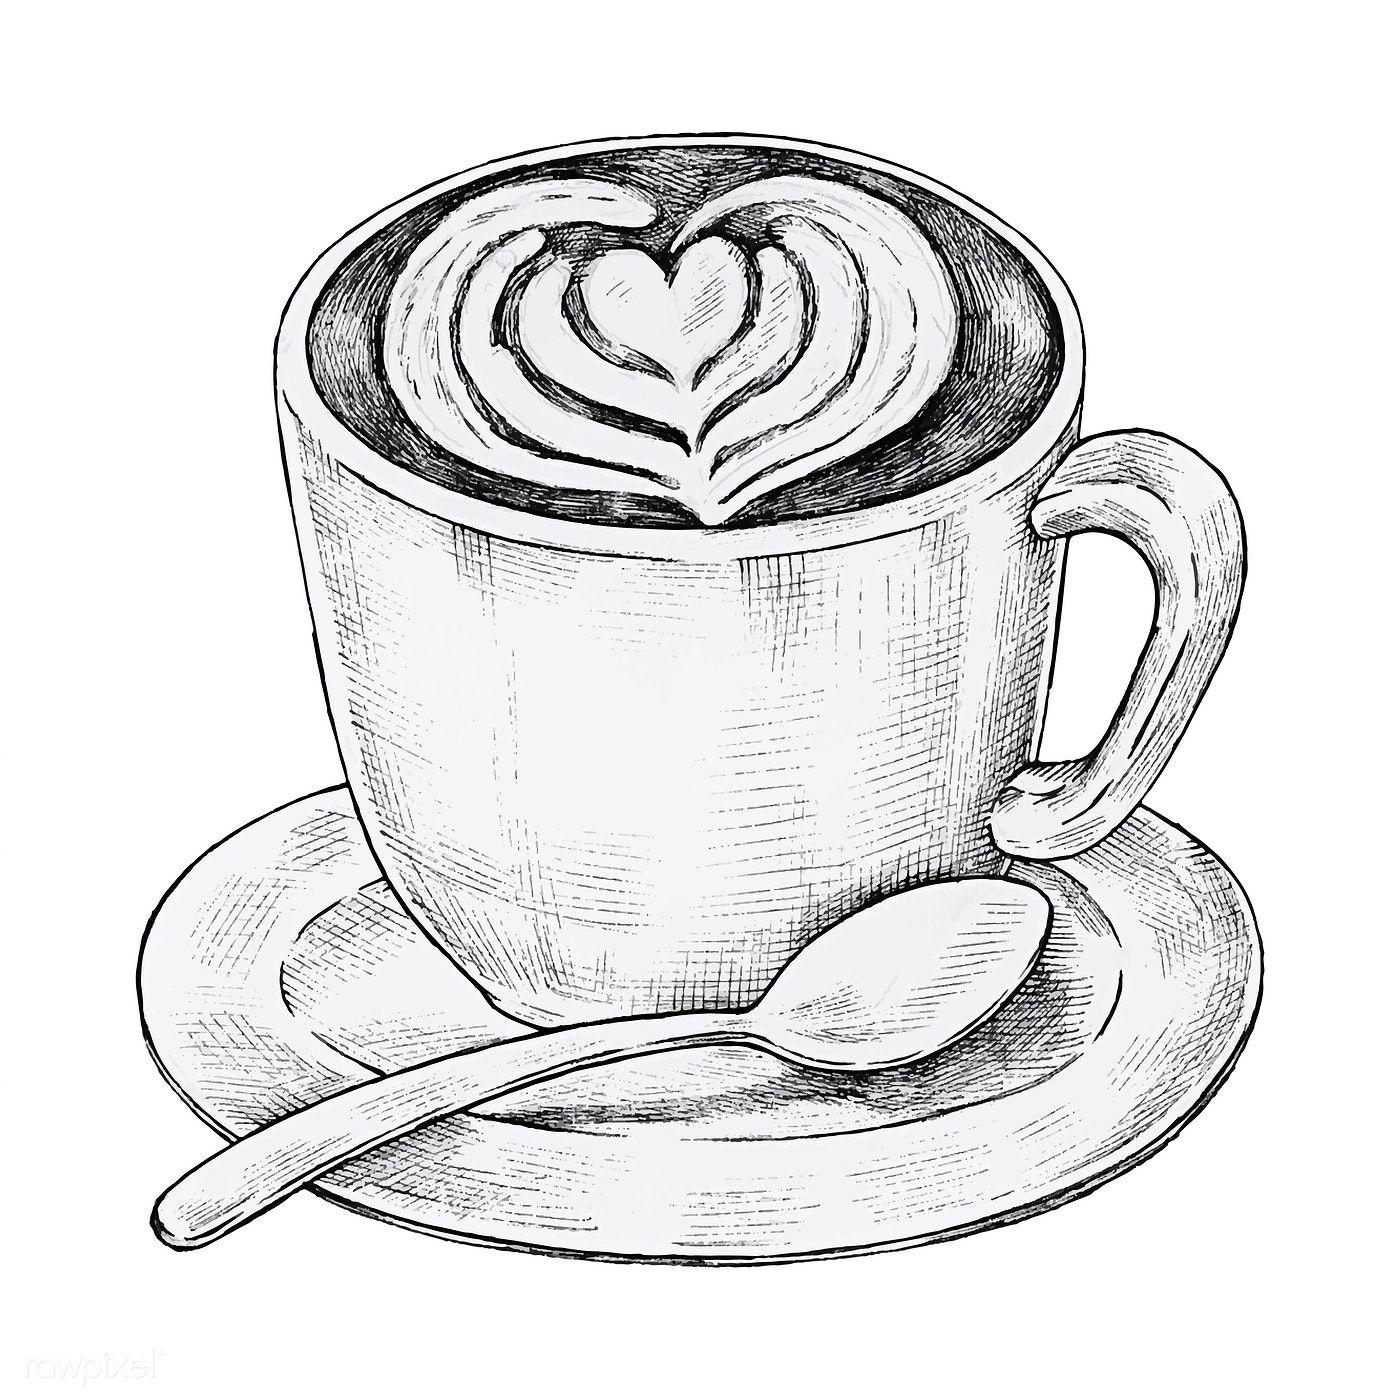 рисунки чашка кофе карандашом разнообразных фактур